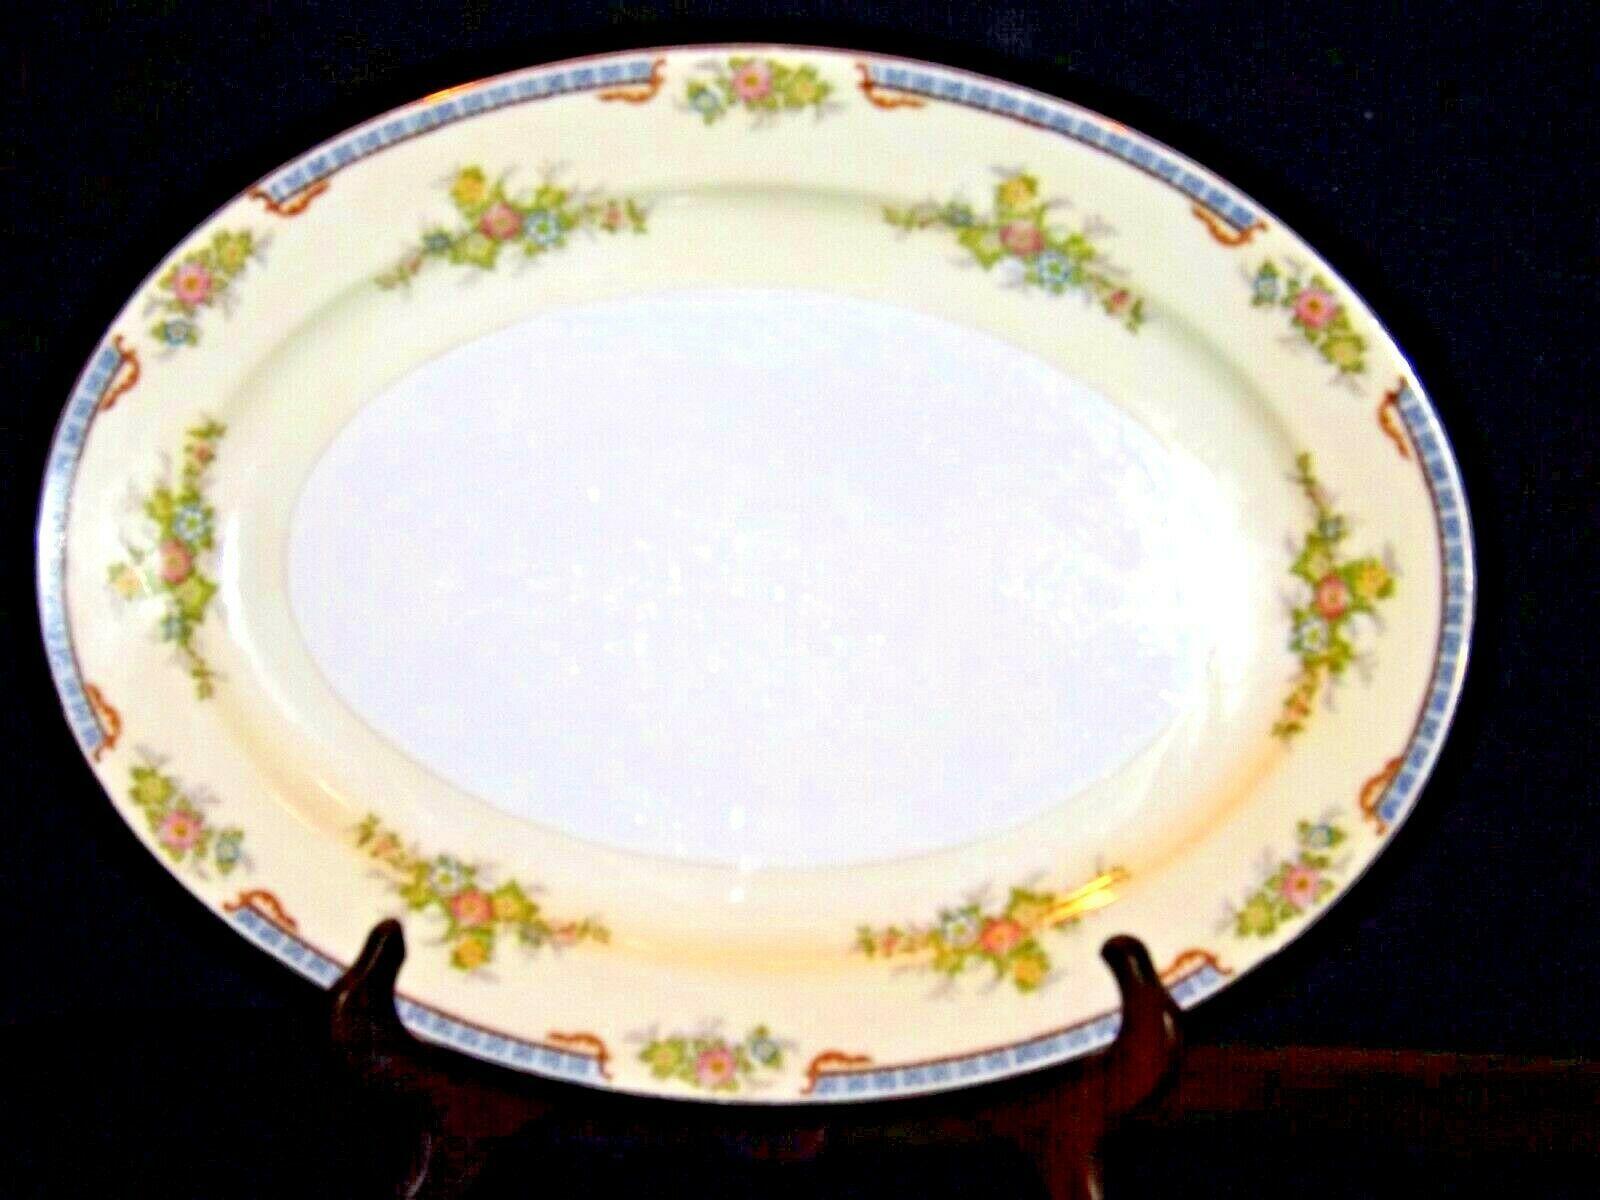 Meita China Large Serving Platter~ Japan Hand Painted AA19-1525 Vintage